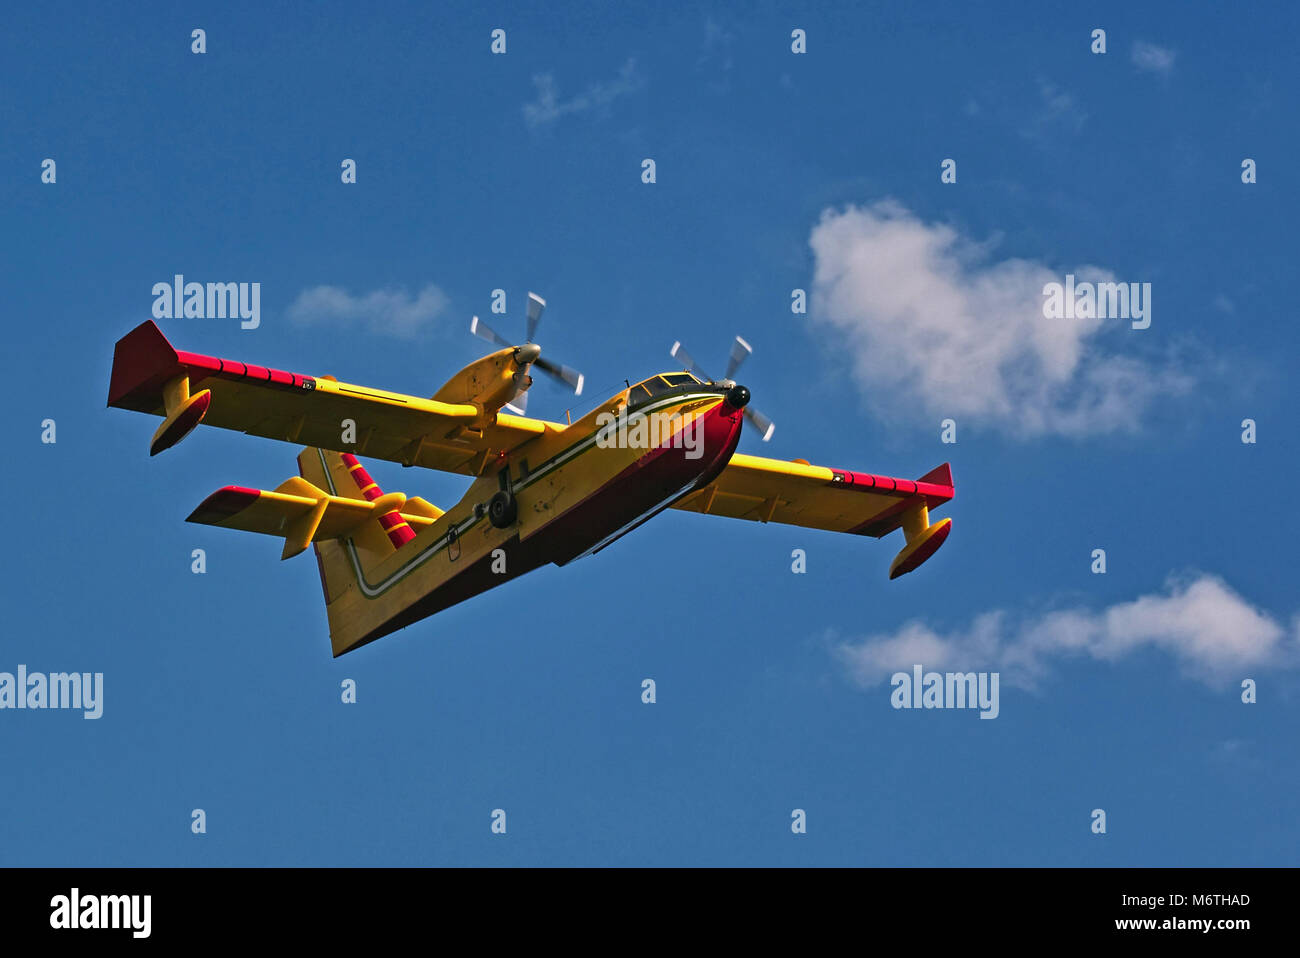 Aircraft Rescue Firefighting Stock Photos & Aircraft Rescue